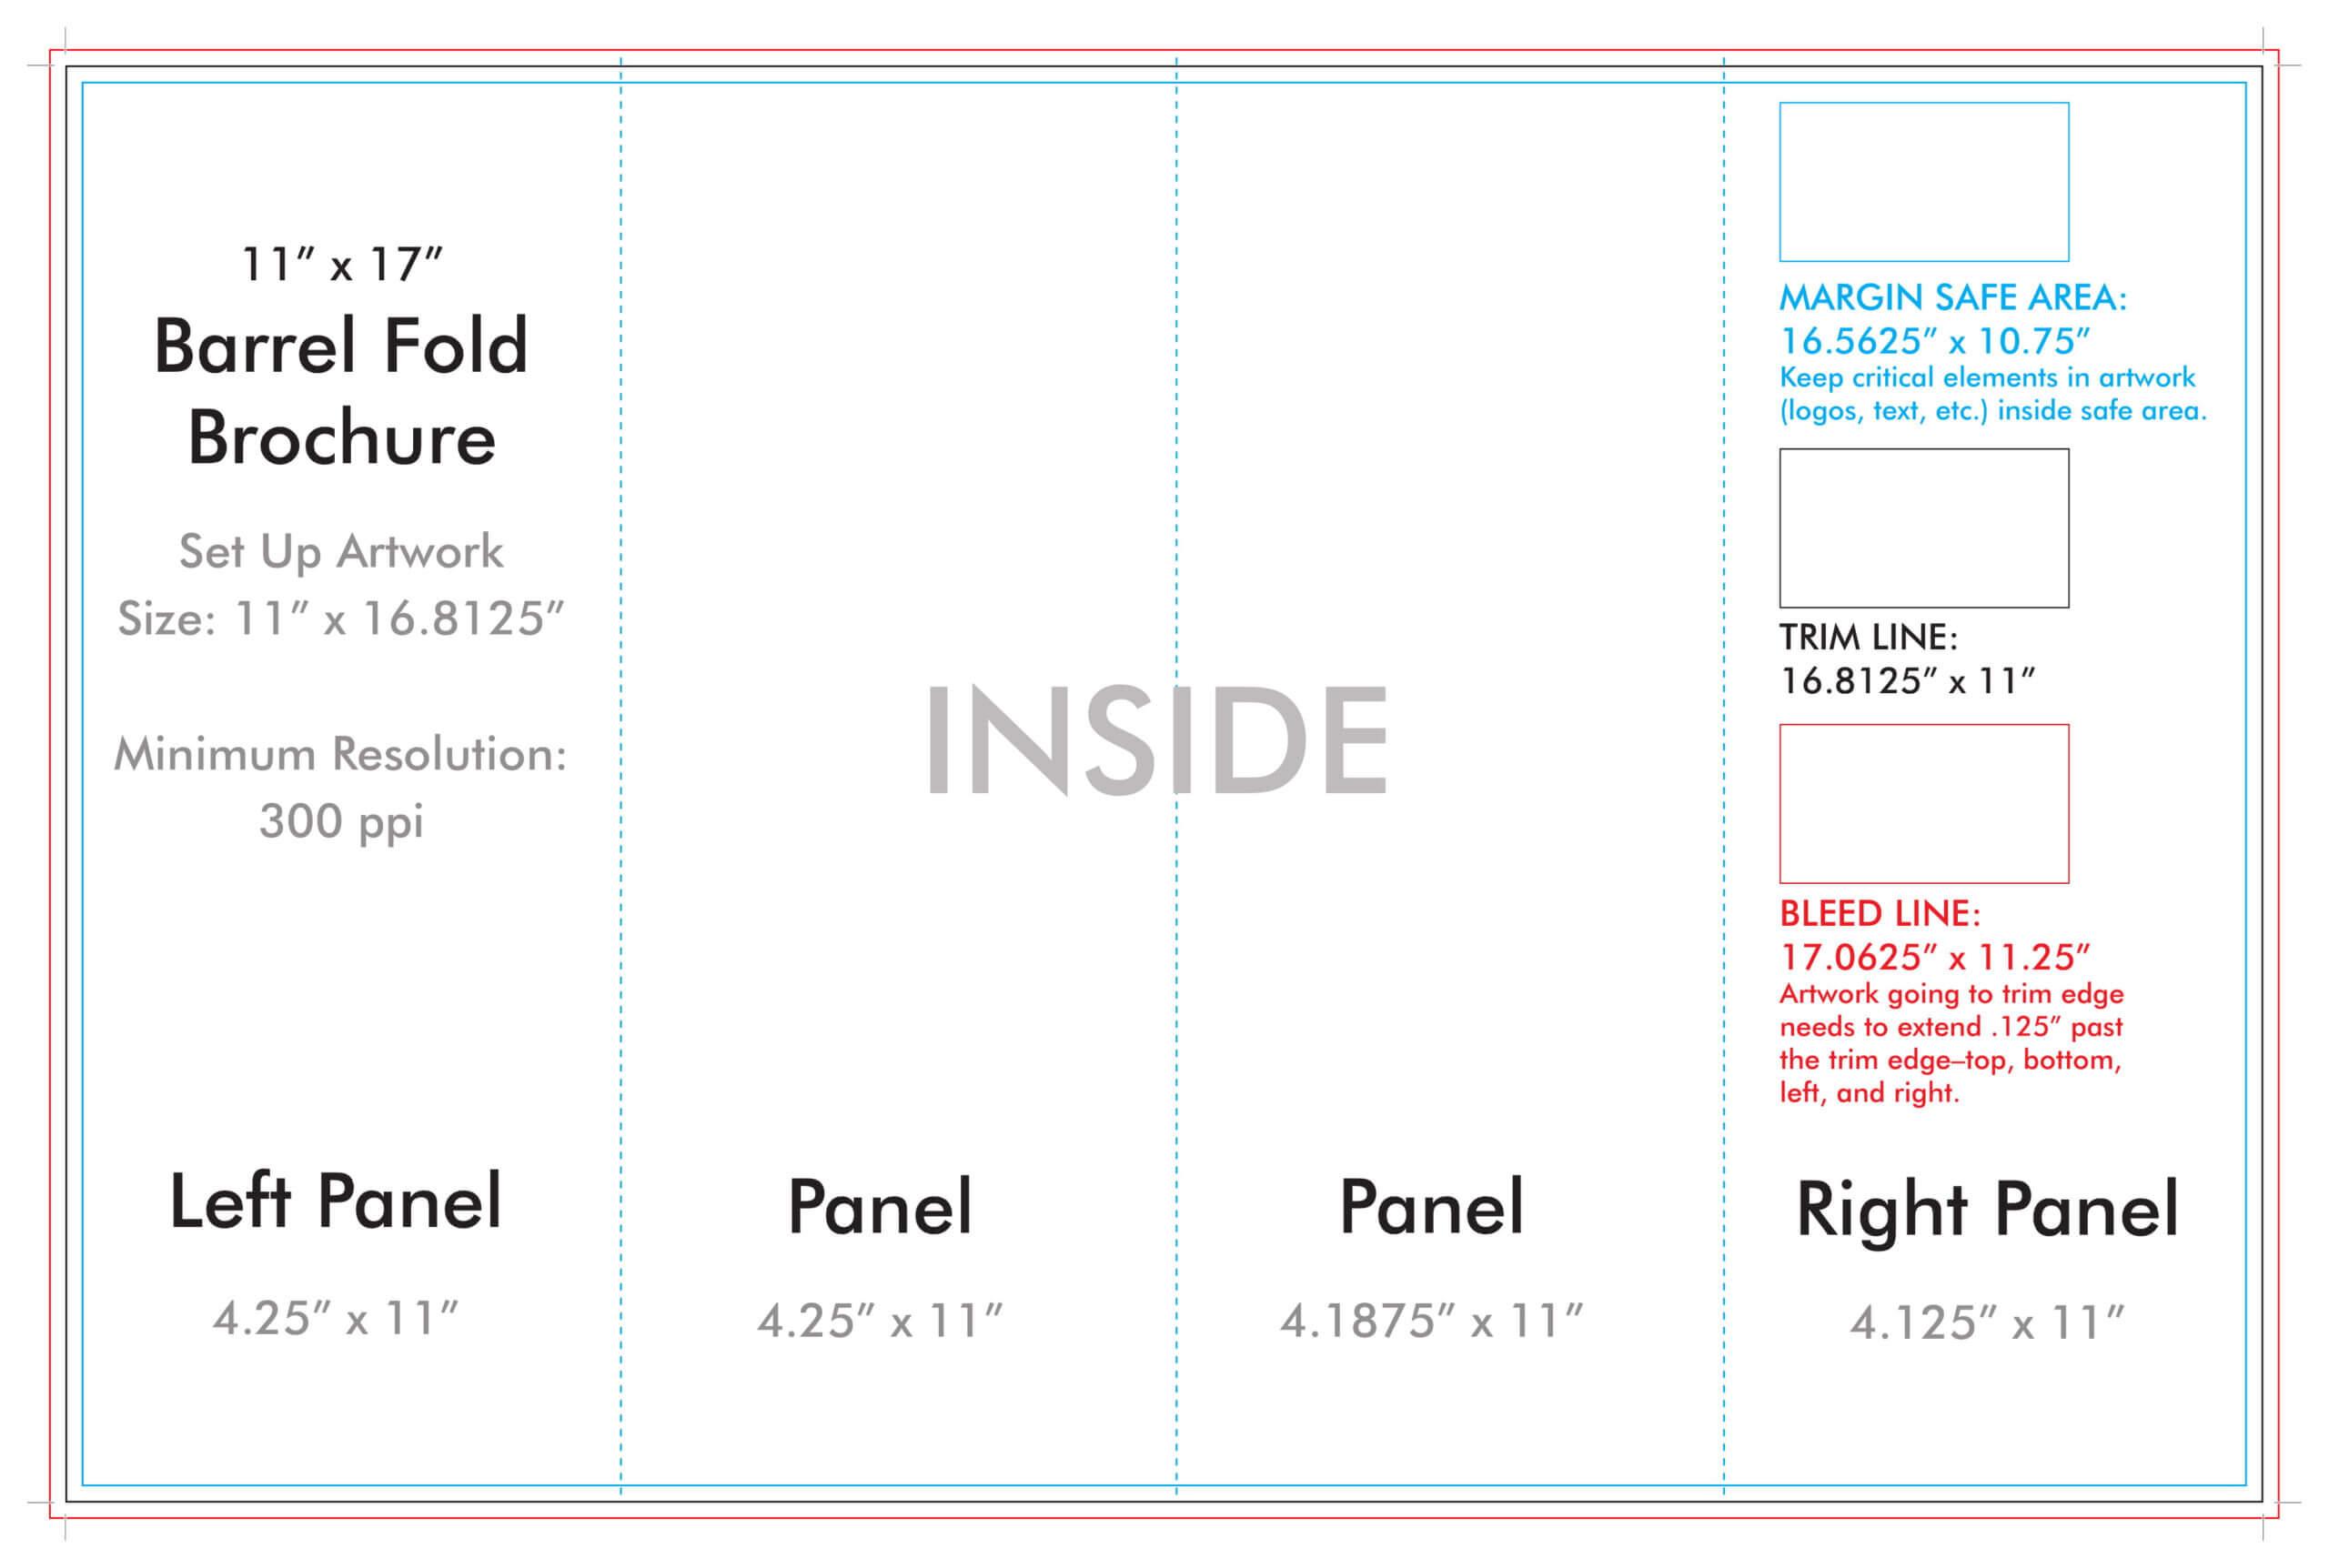 4 Fold Brochure Template - Calep.midnightpig.co For Brochure 4 Fold Template